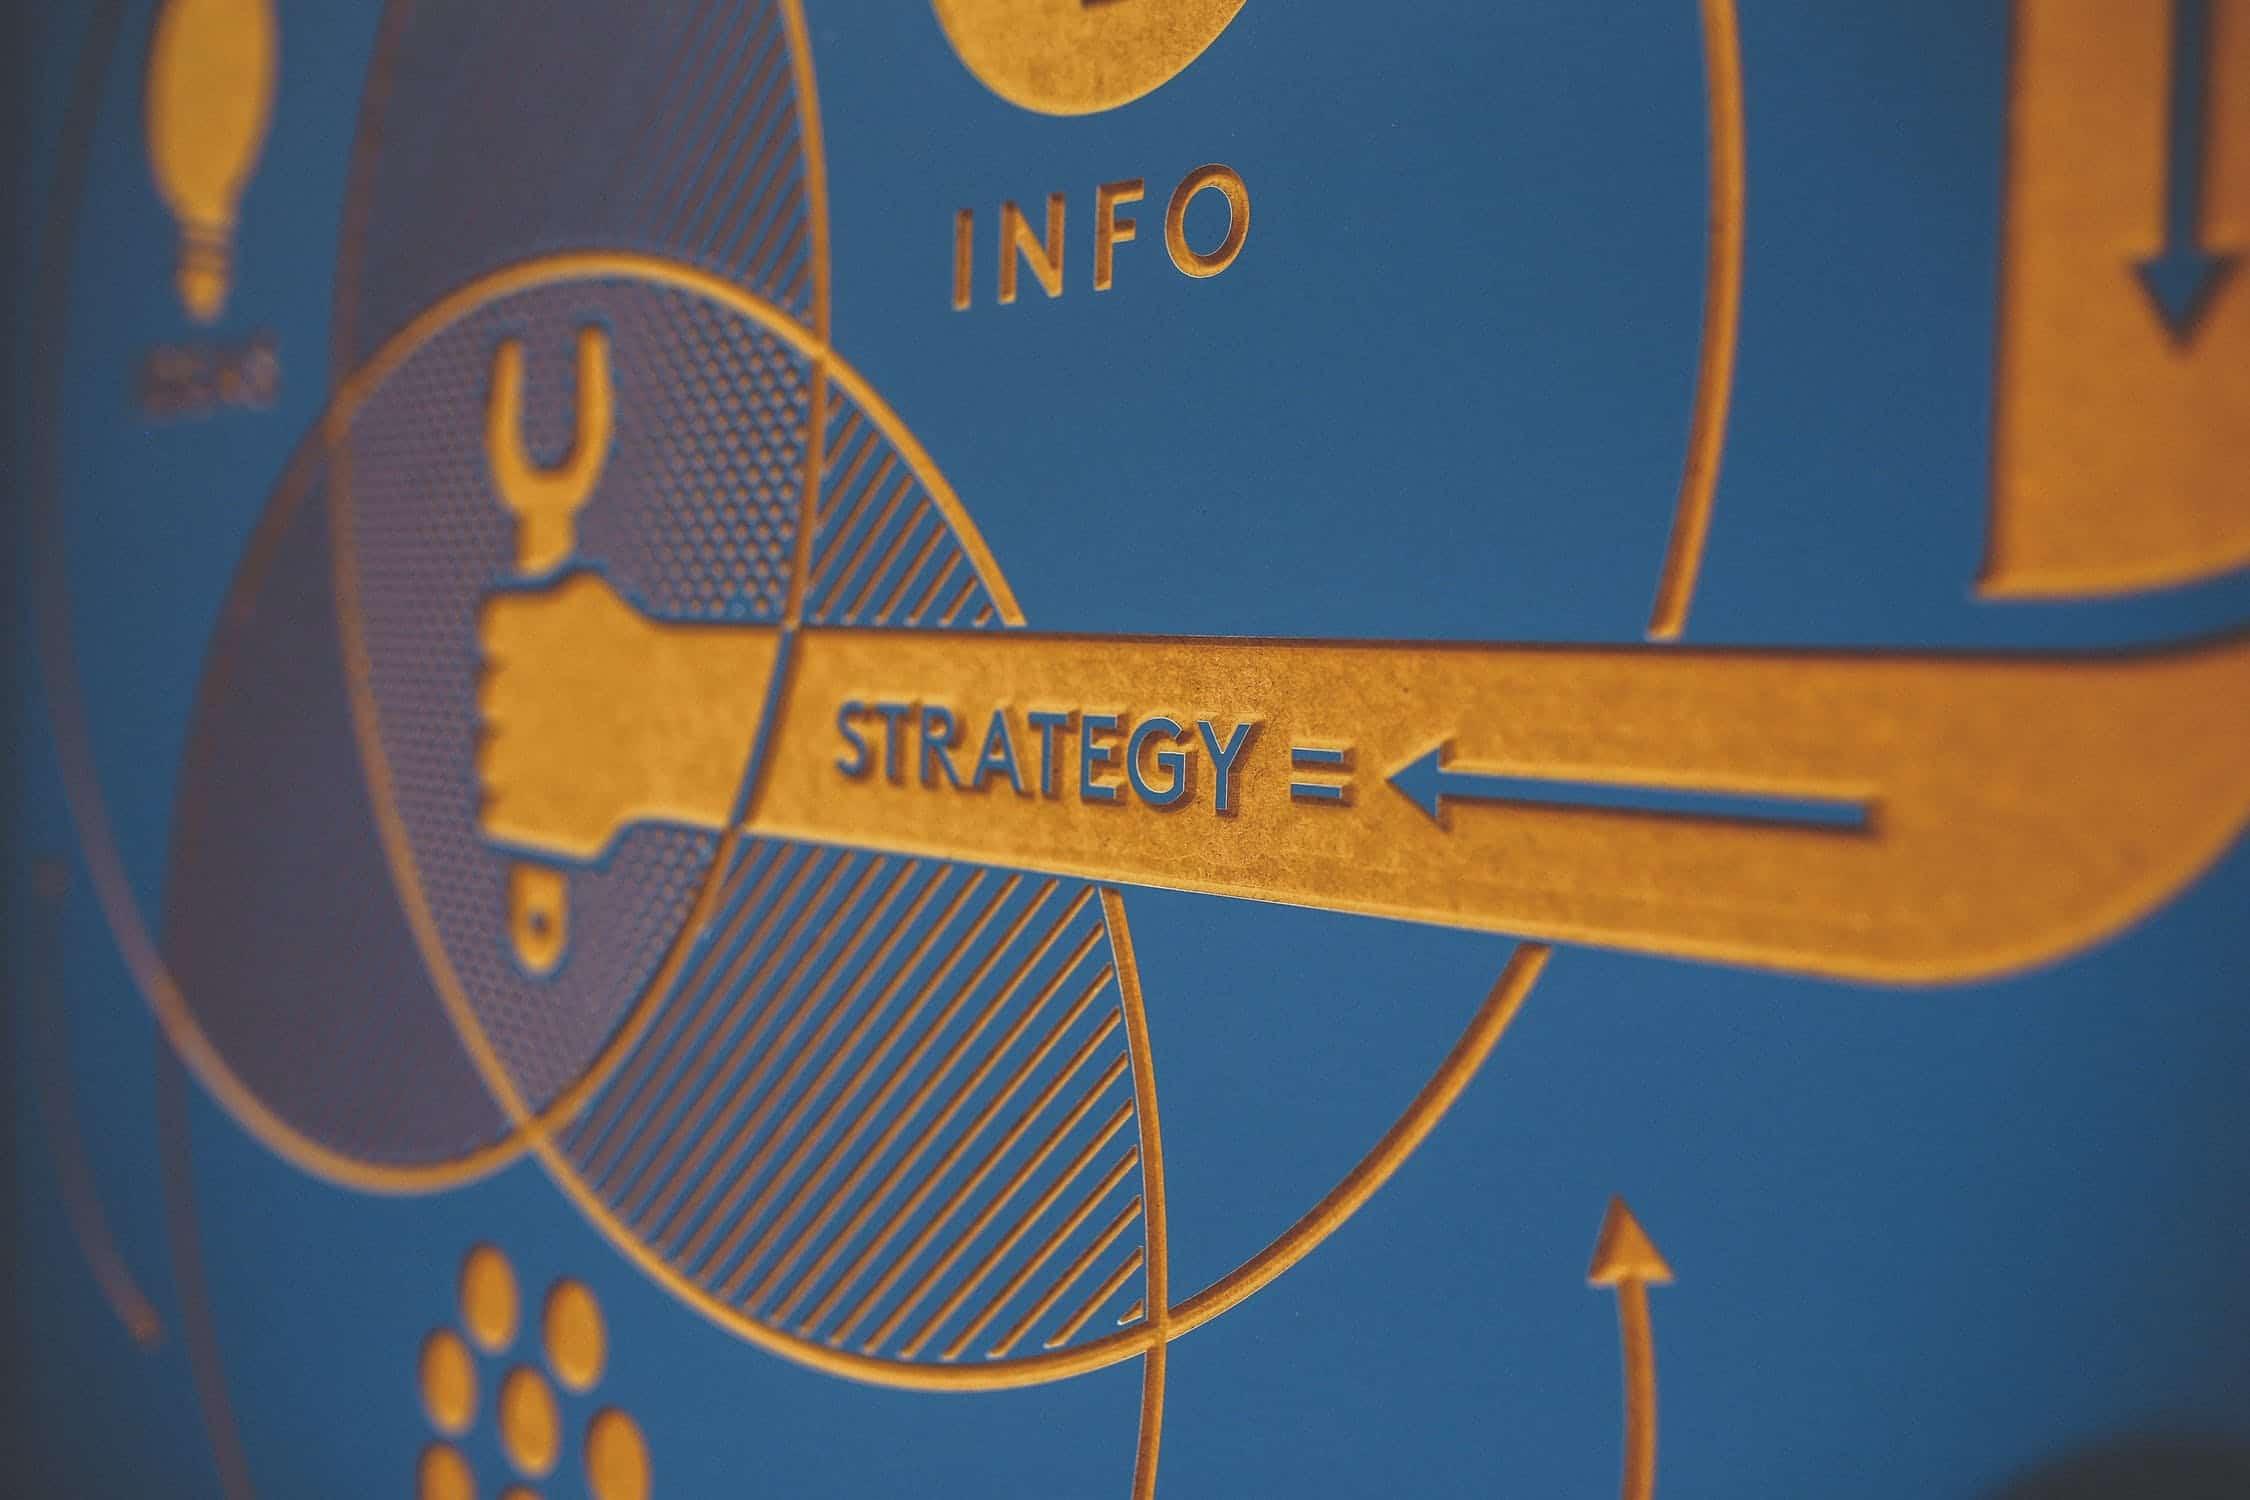 Is digital marketing free or paid?